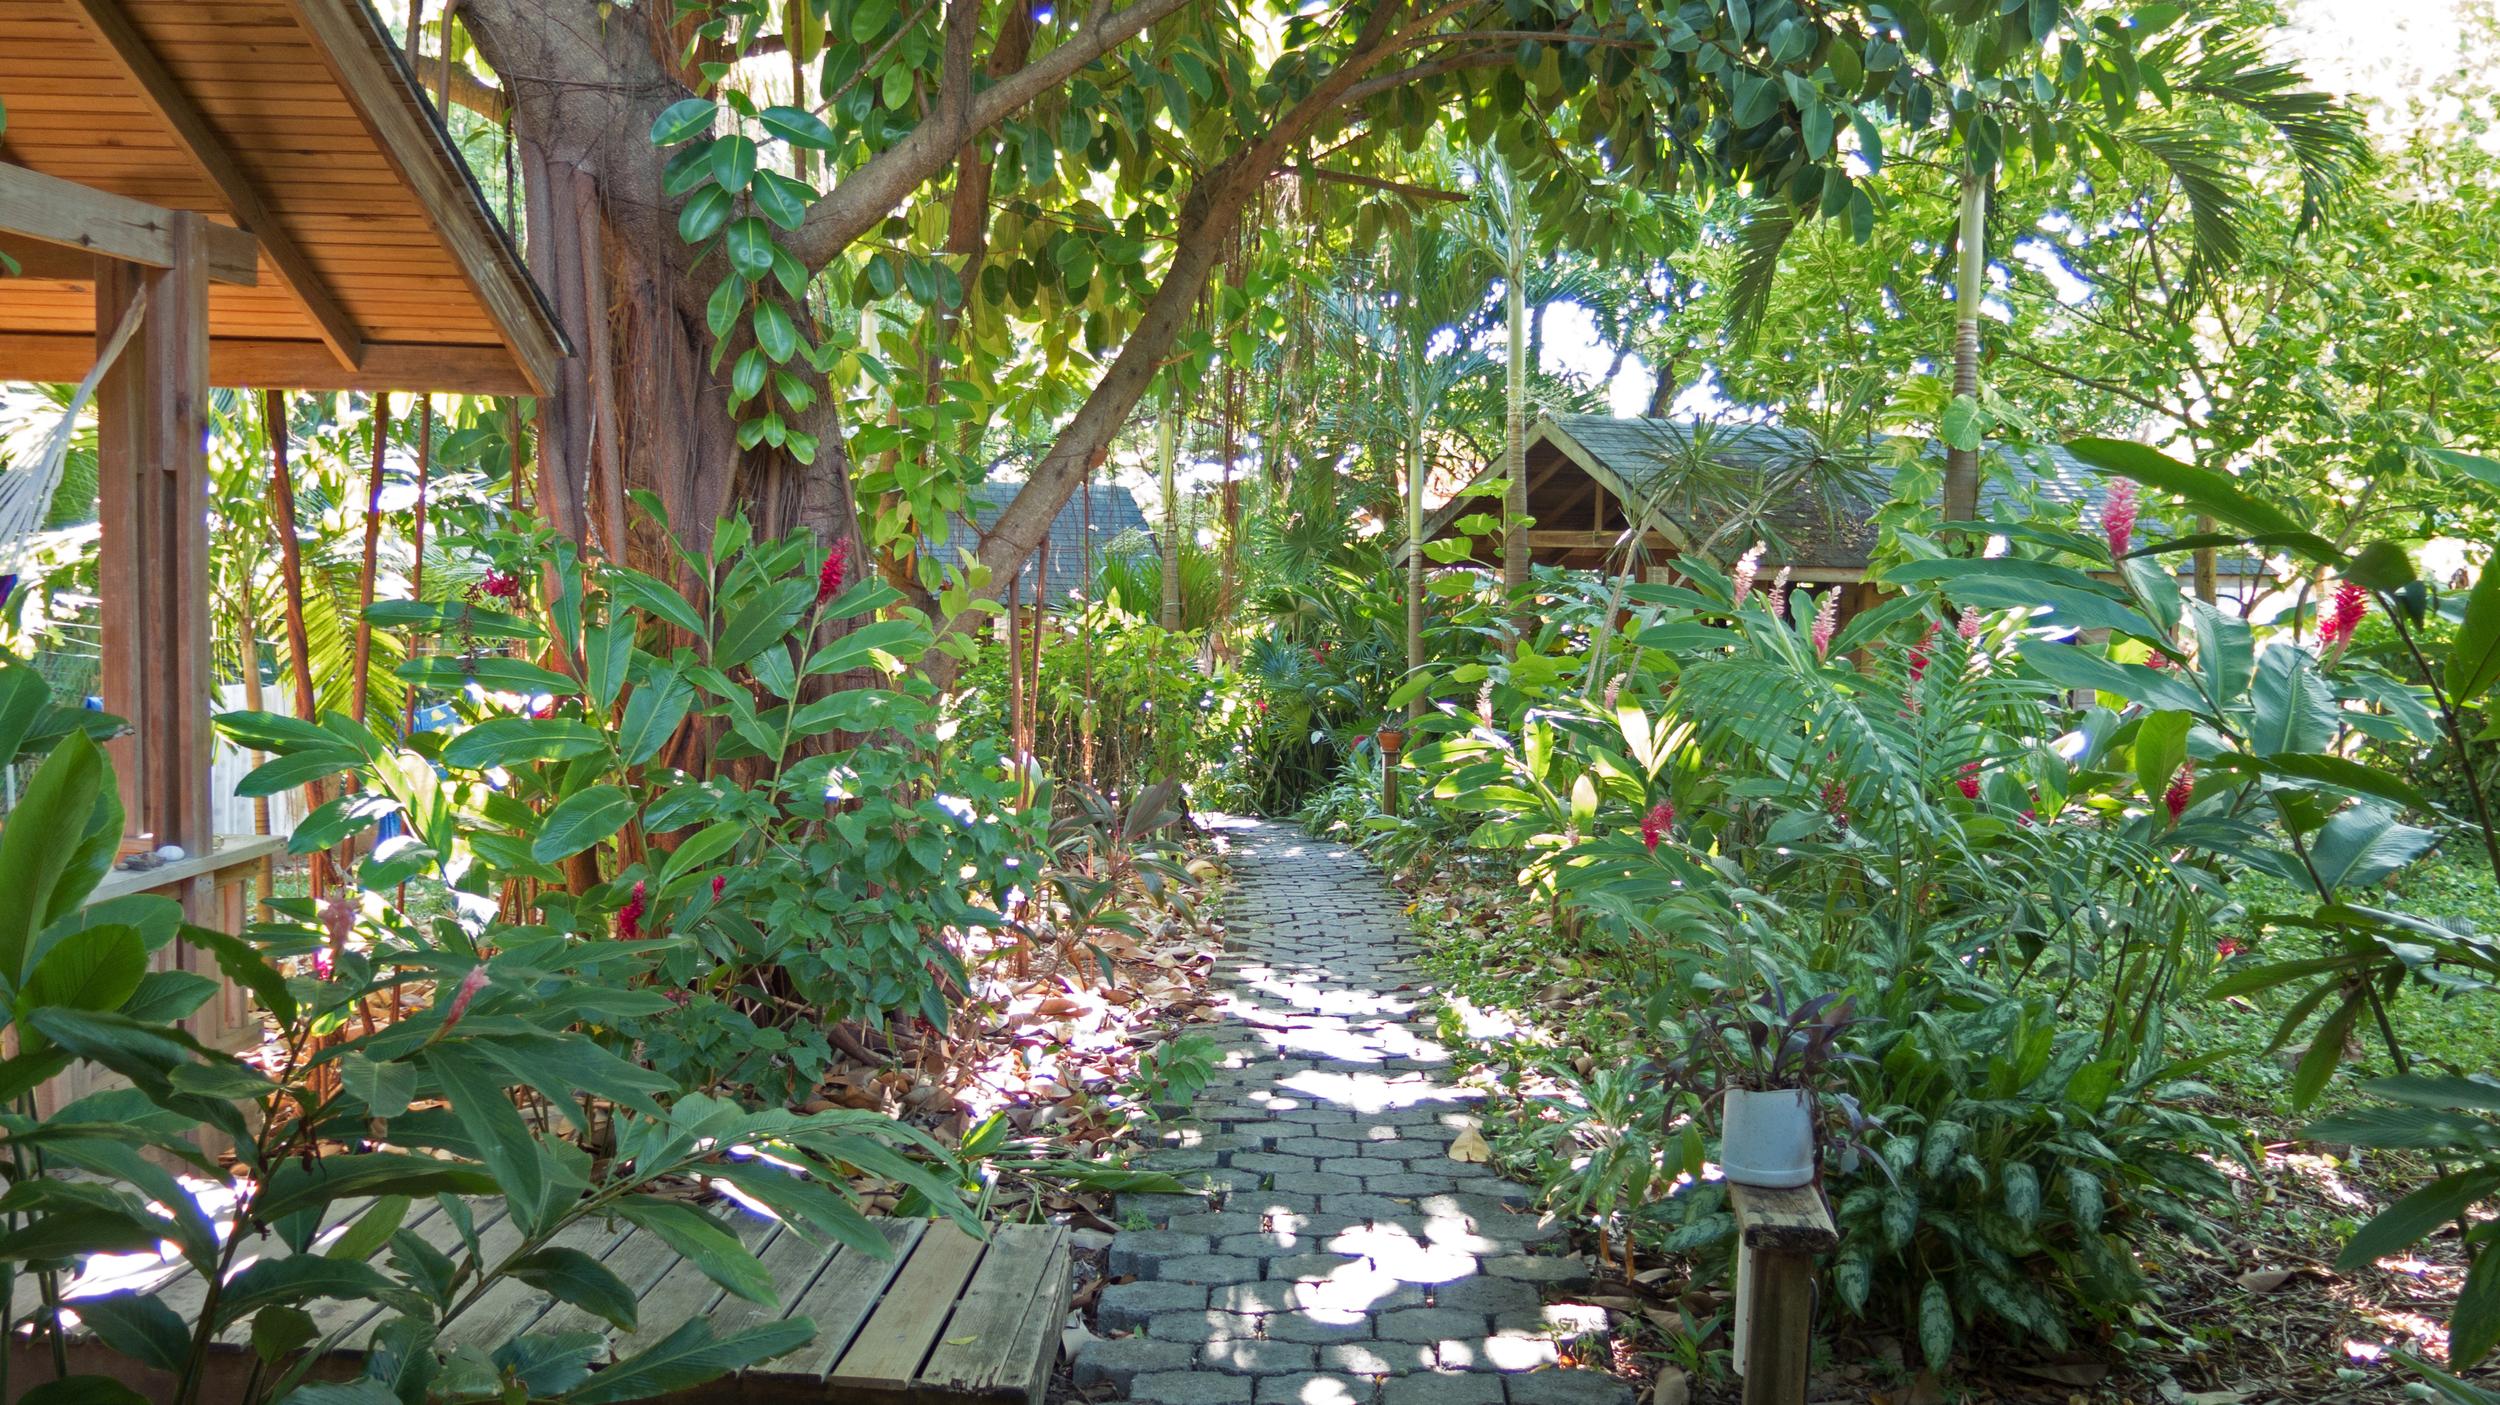 Garden path, Hotel Chillies, West End, Roatan